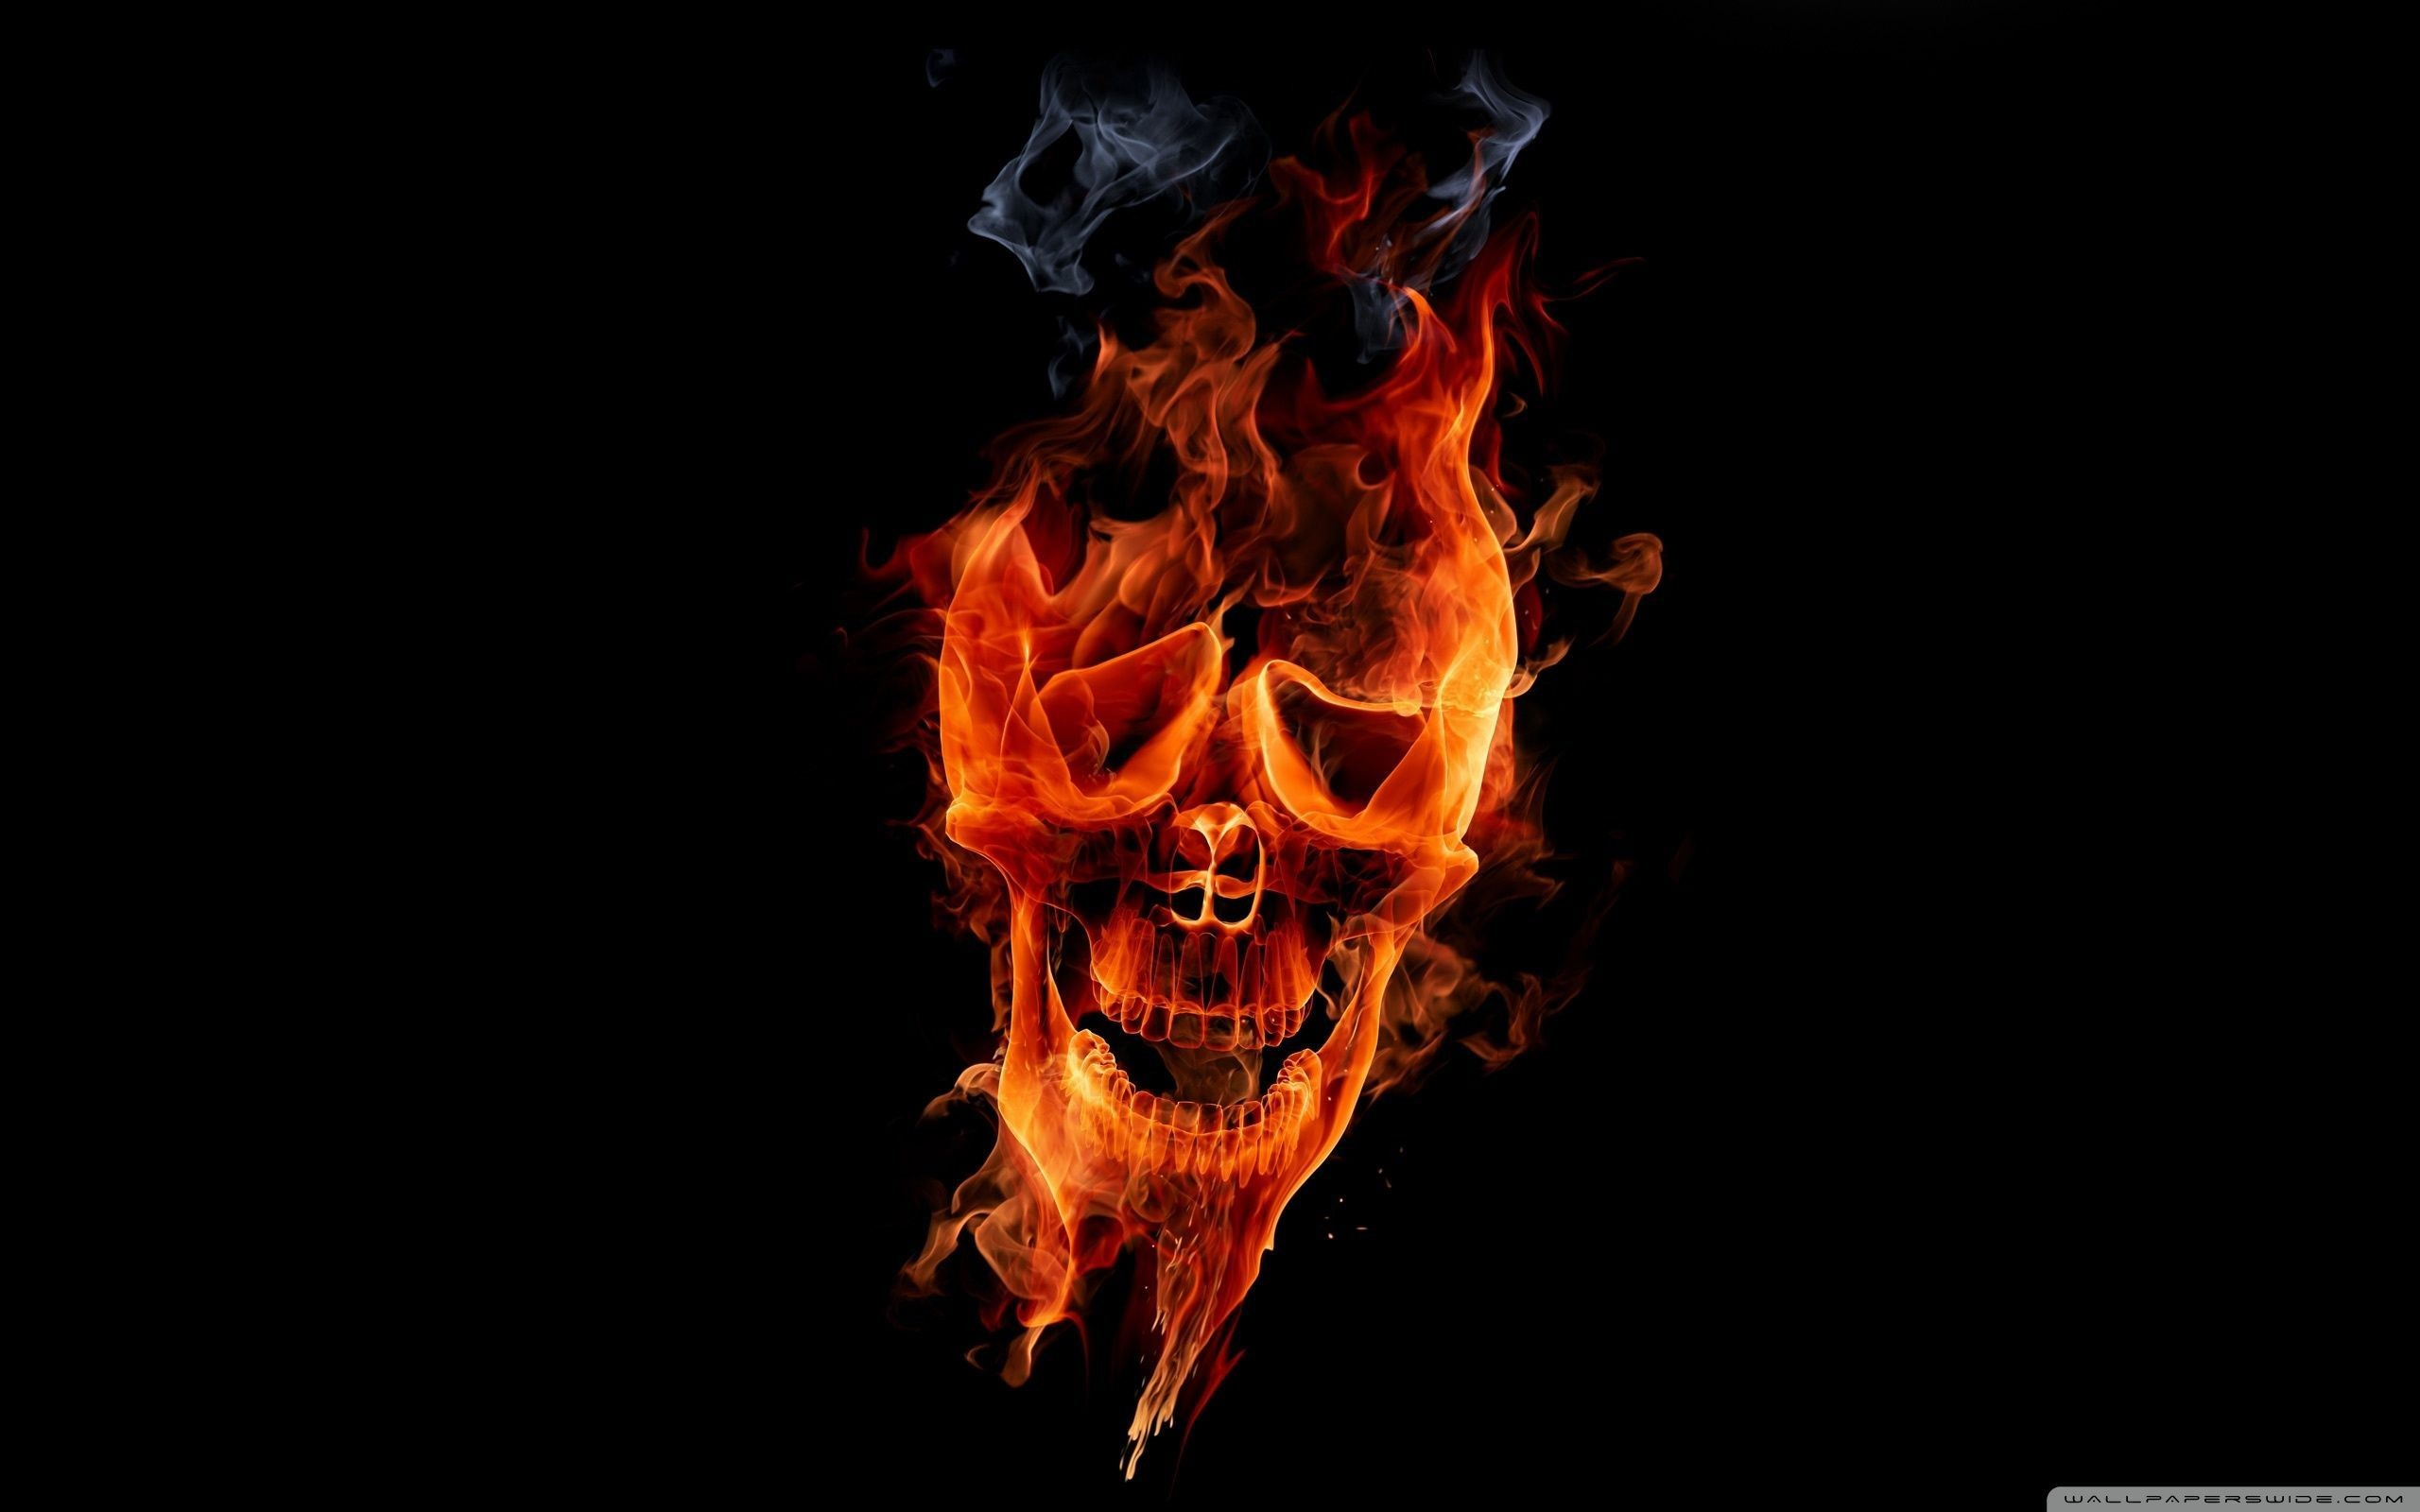 Fire Skull Wallpaper Full HD [2560×1600] – Free wallpaper full hd .